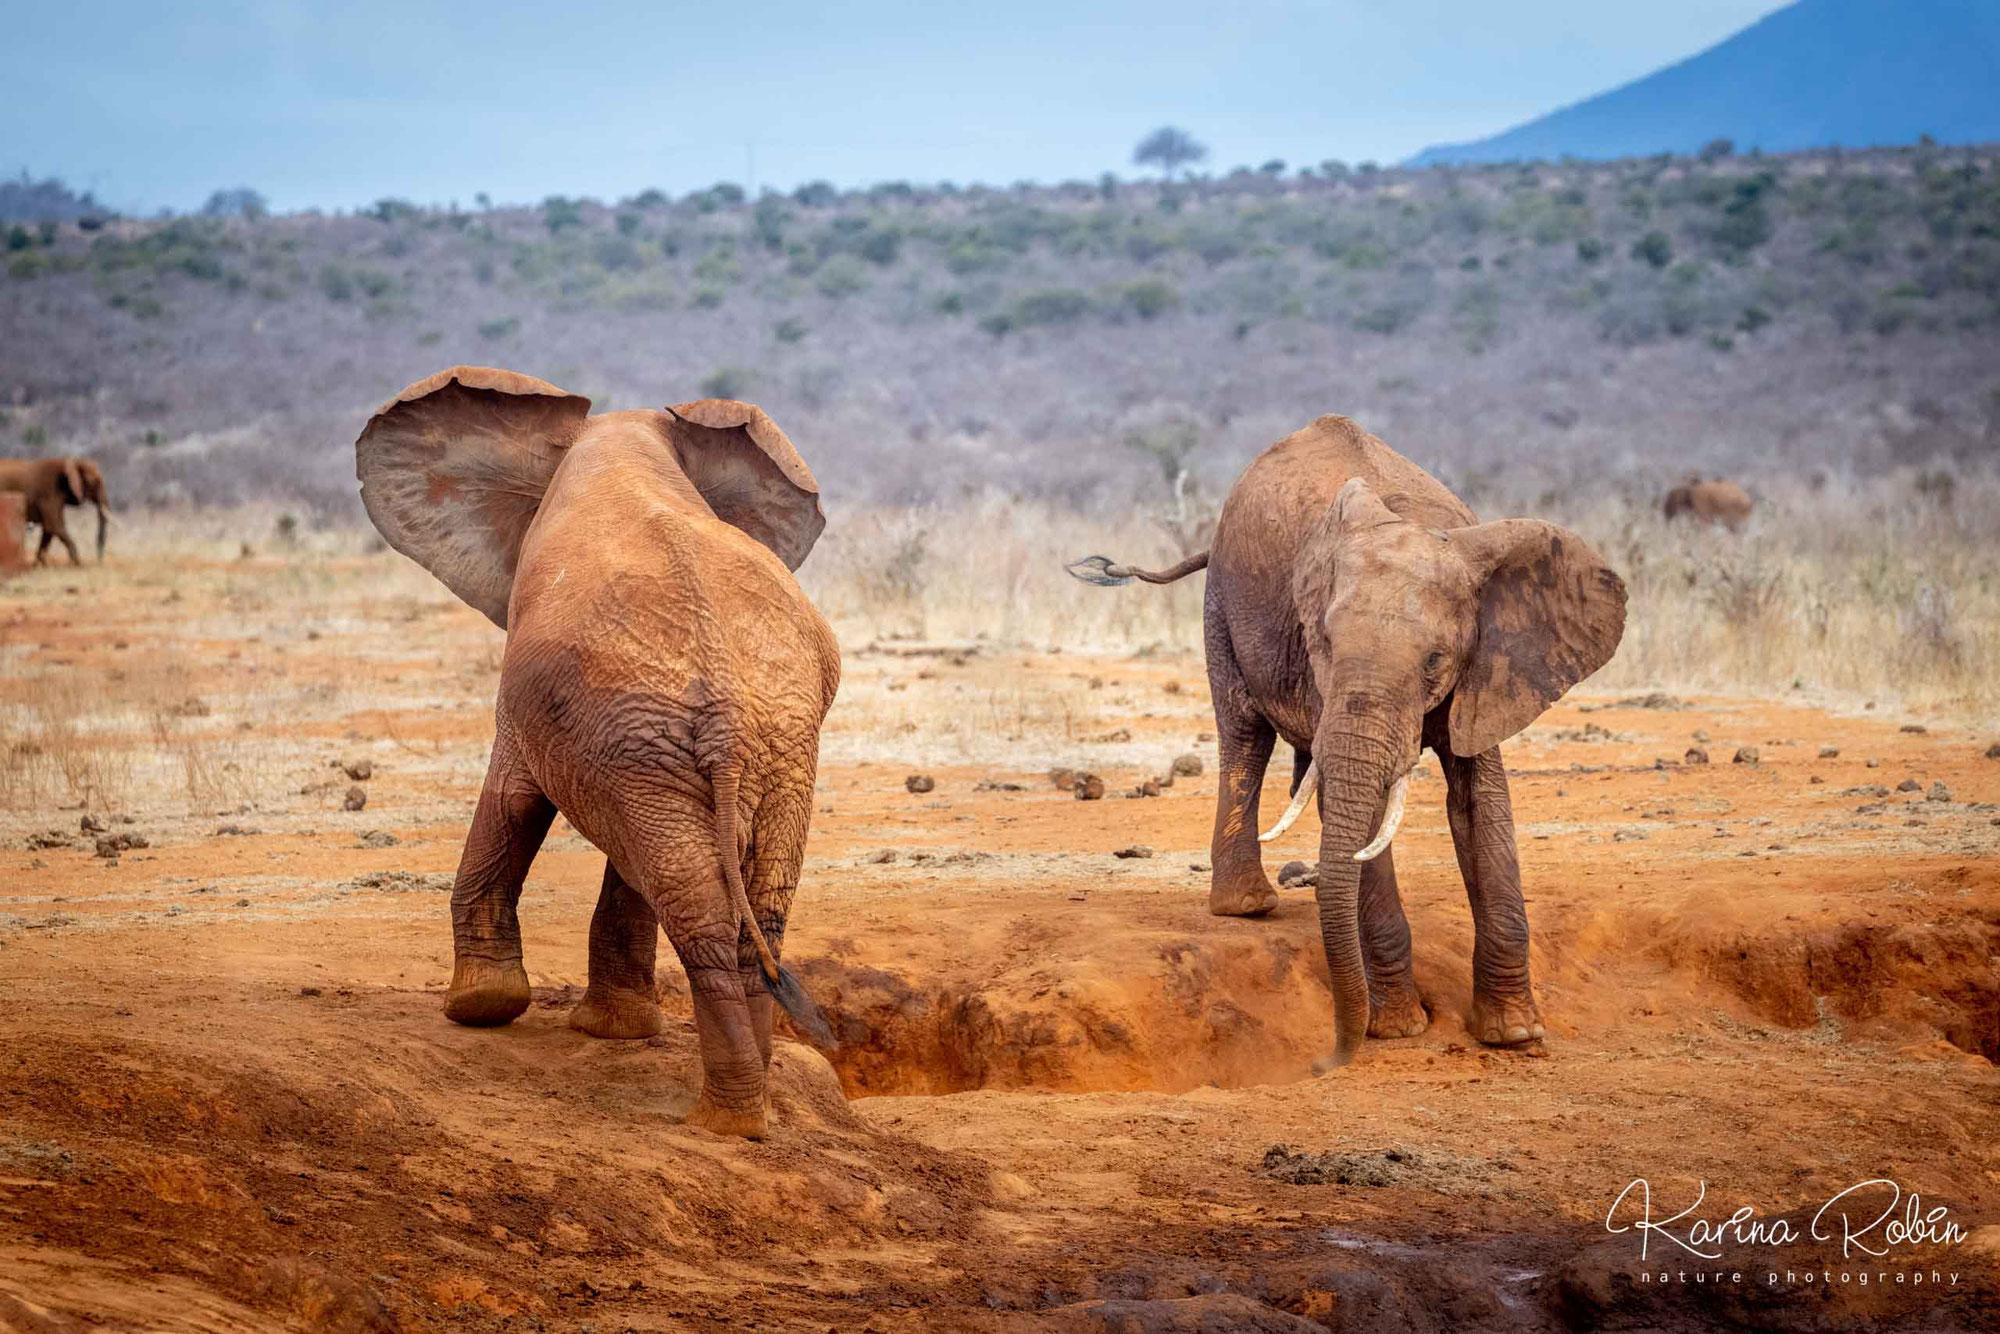 Kenyan safari, part one: TSAVO EAST